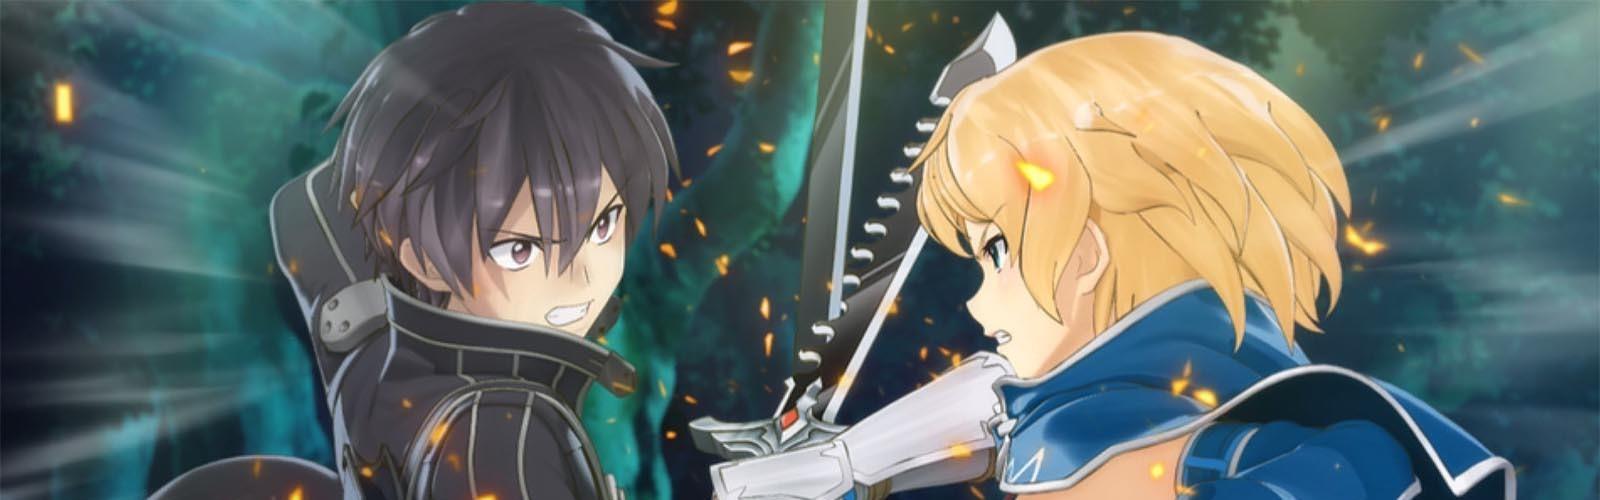 Sword Art Online Re: Hollow Fragment Steam Key GLOBAL